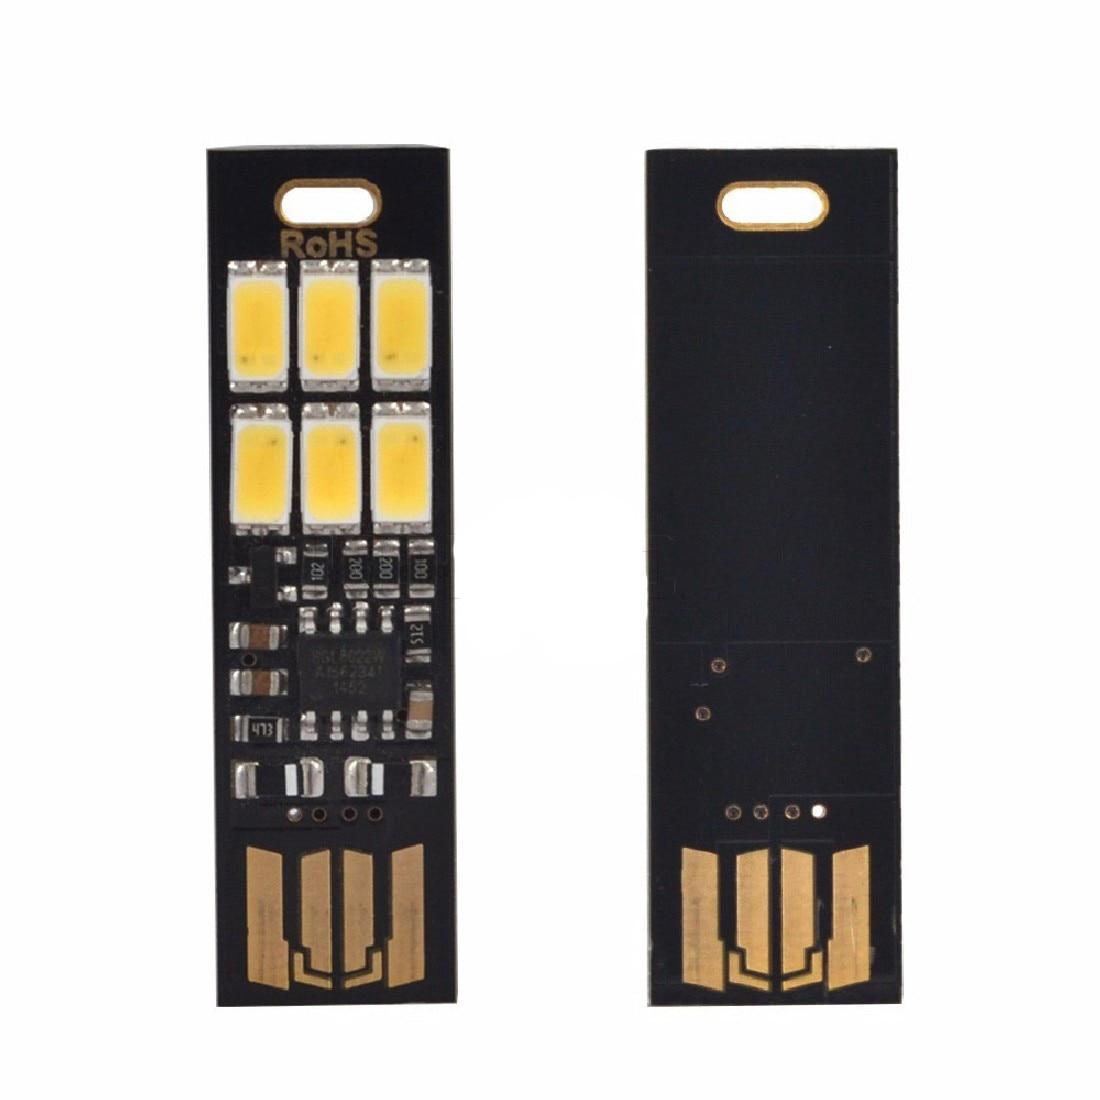 6 LED Mini Adjust Brightness Night Lights Finger Touch Lamp Dimmer Pocket Card USB Power For Power Computer Laptop